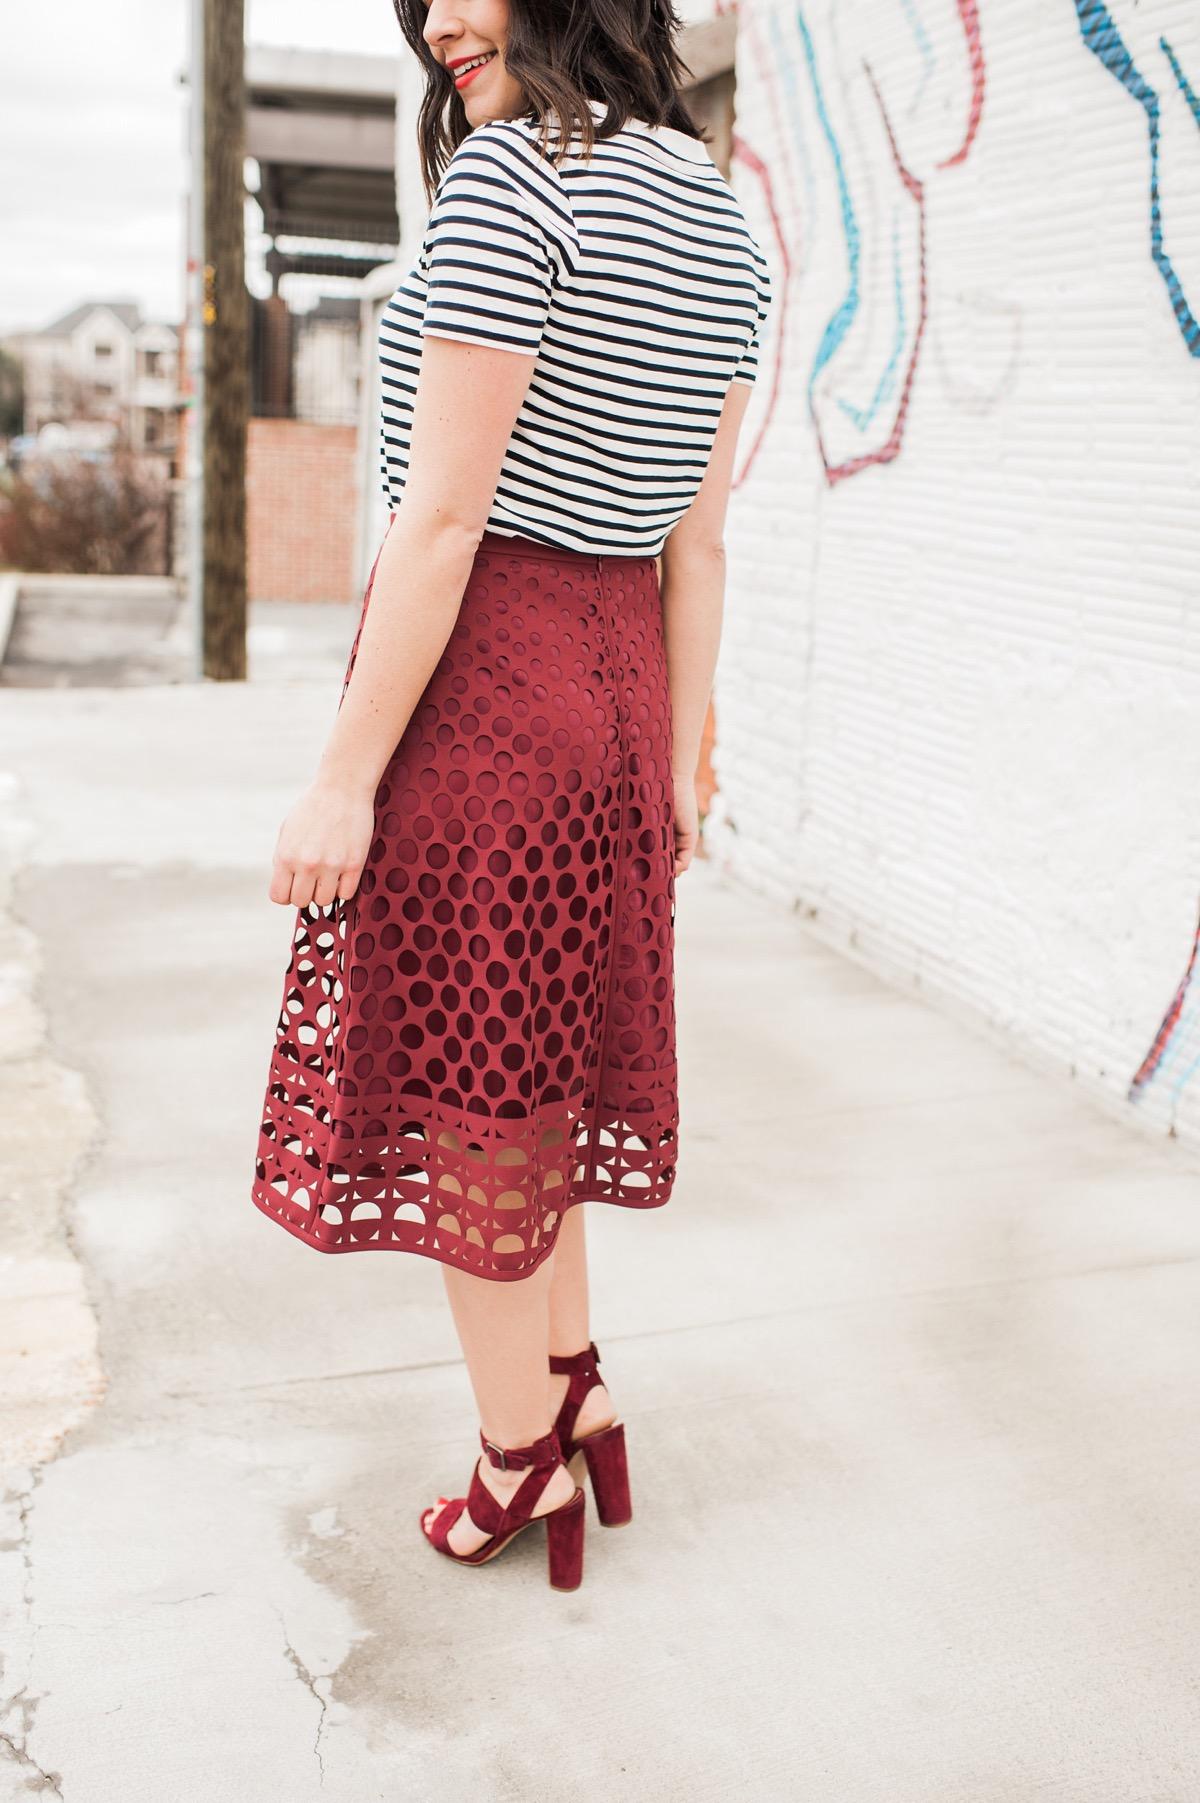 striped tee and midi skirt outfit ideas - My Style Vita @mystylevita